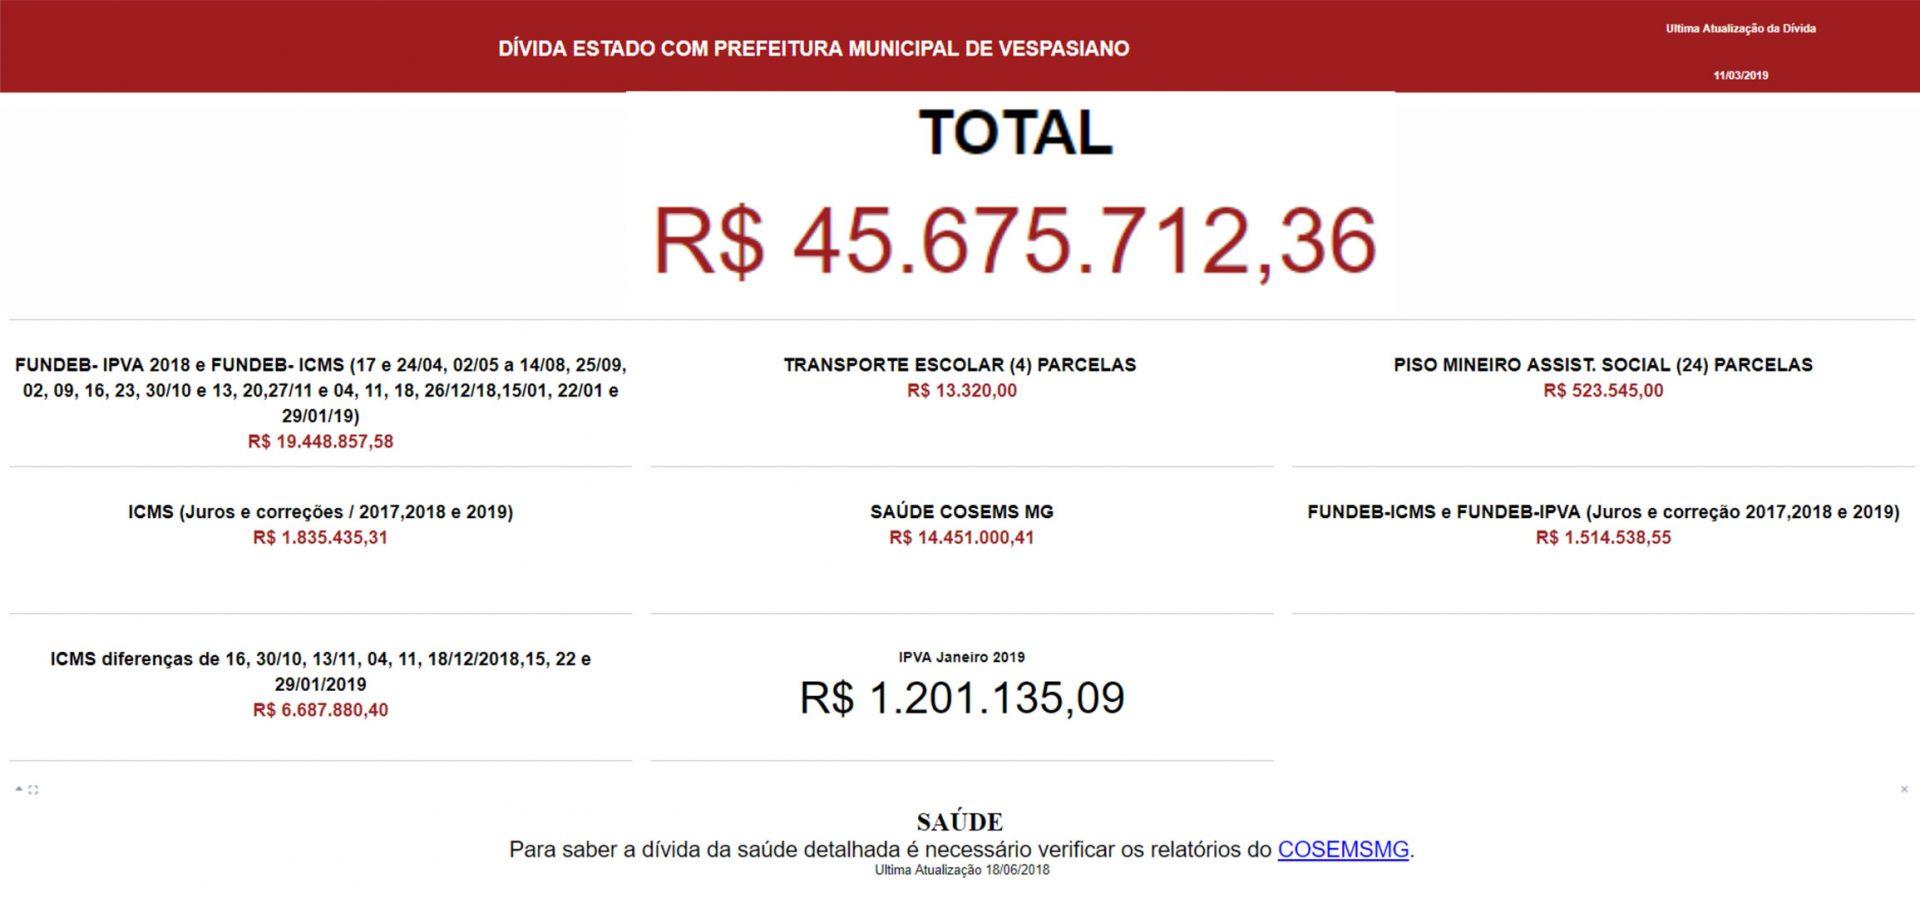 Dívida 11 de Março